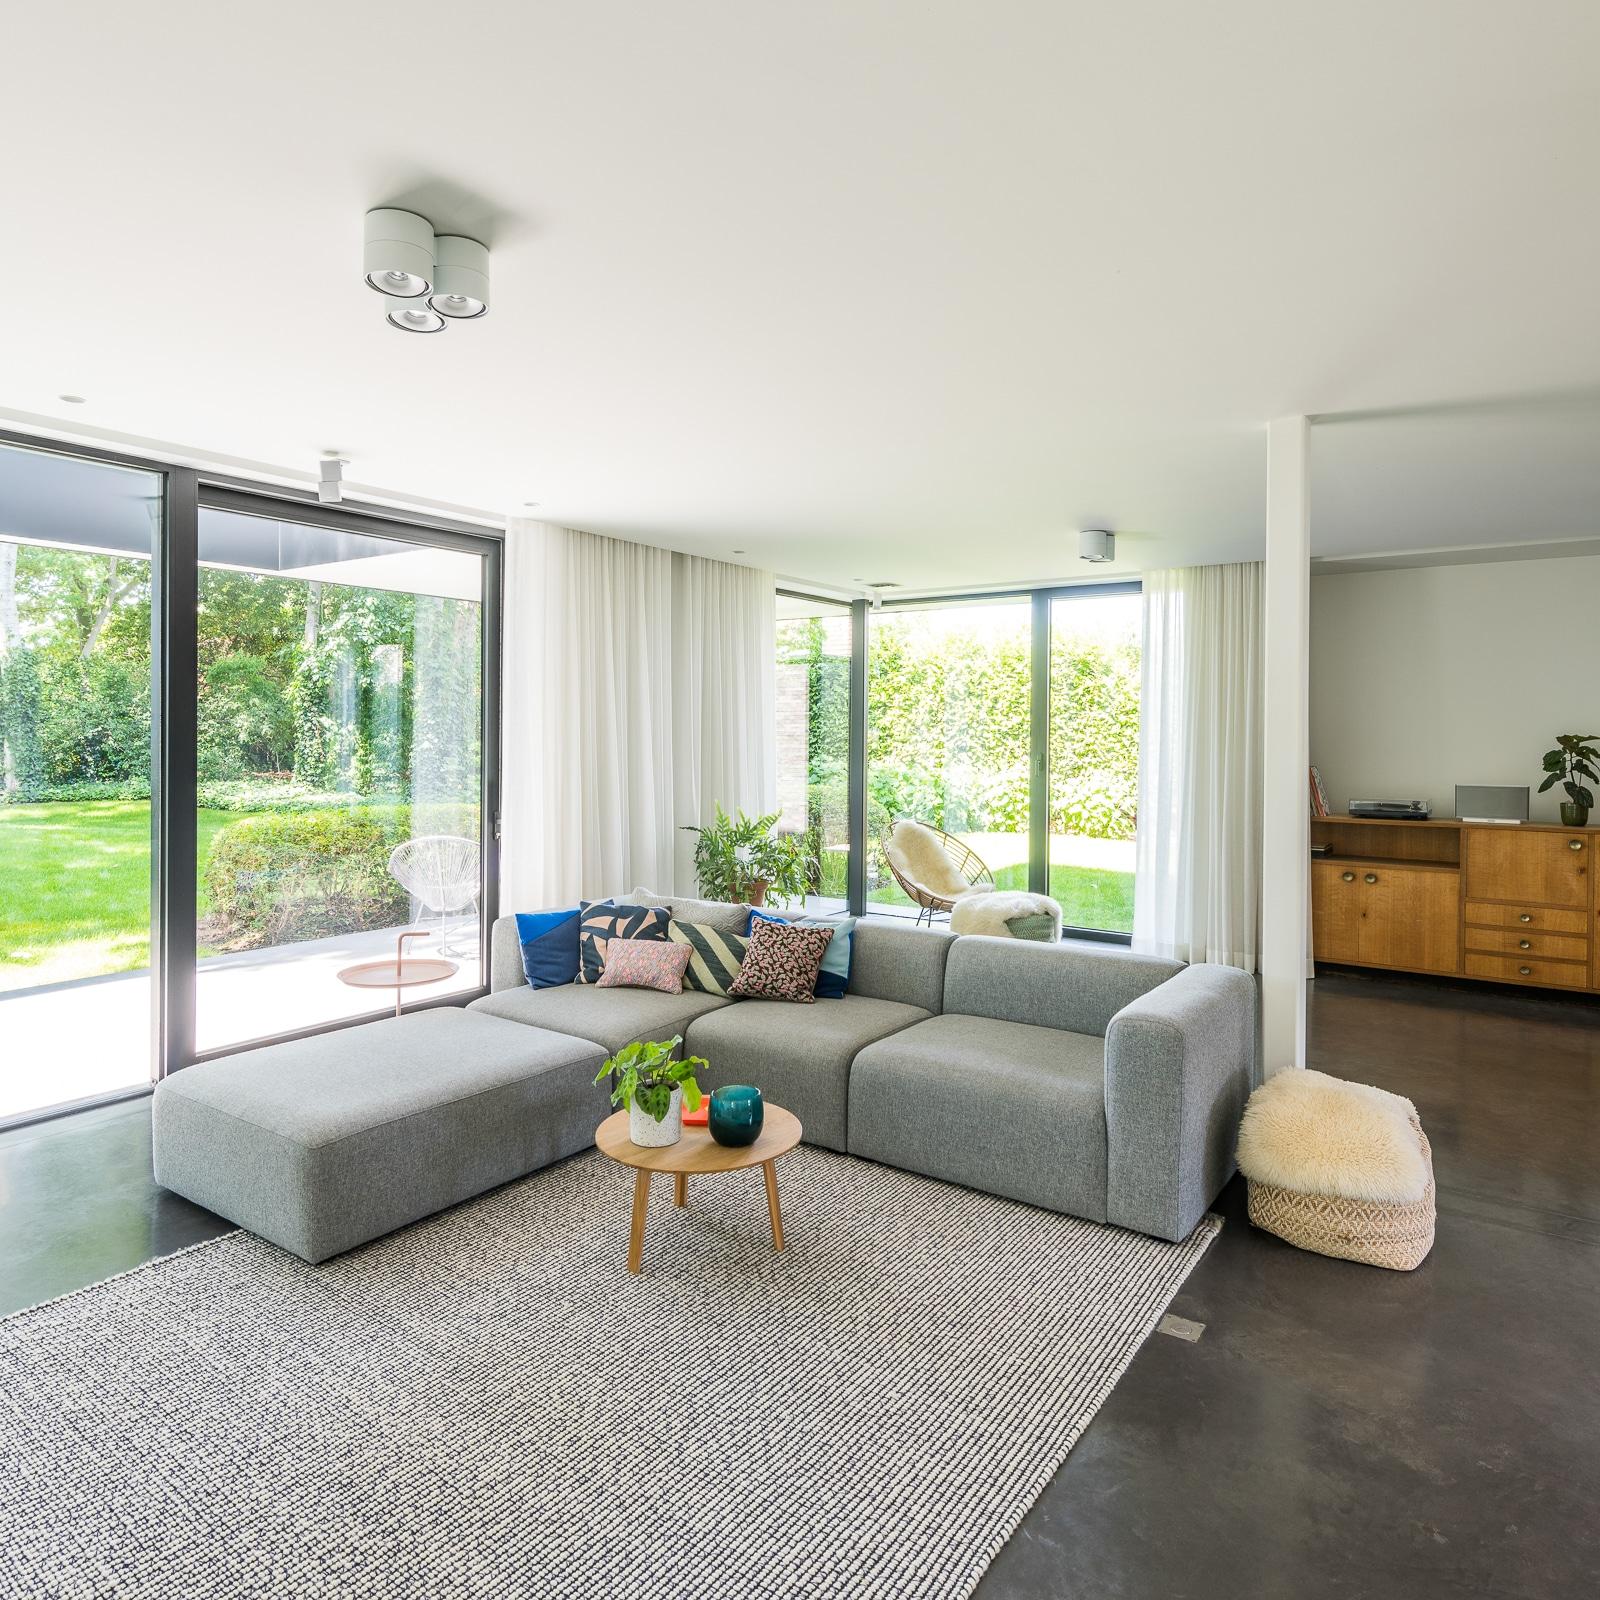 BaeyensBeck Kjell 042web | Baeyens & Beck architecten Gent | architect nieuwbouw renovatie interieur | high end | architectenbureau